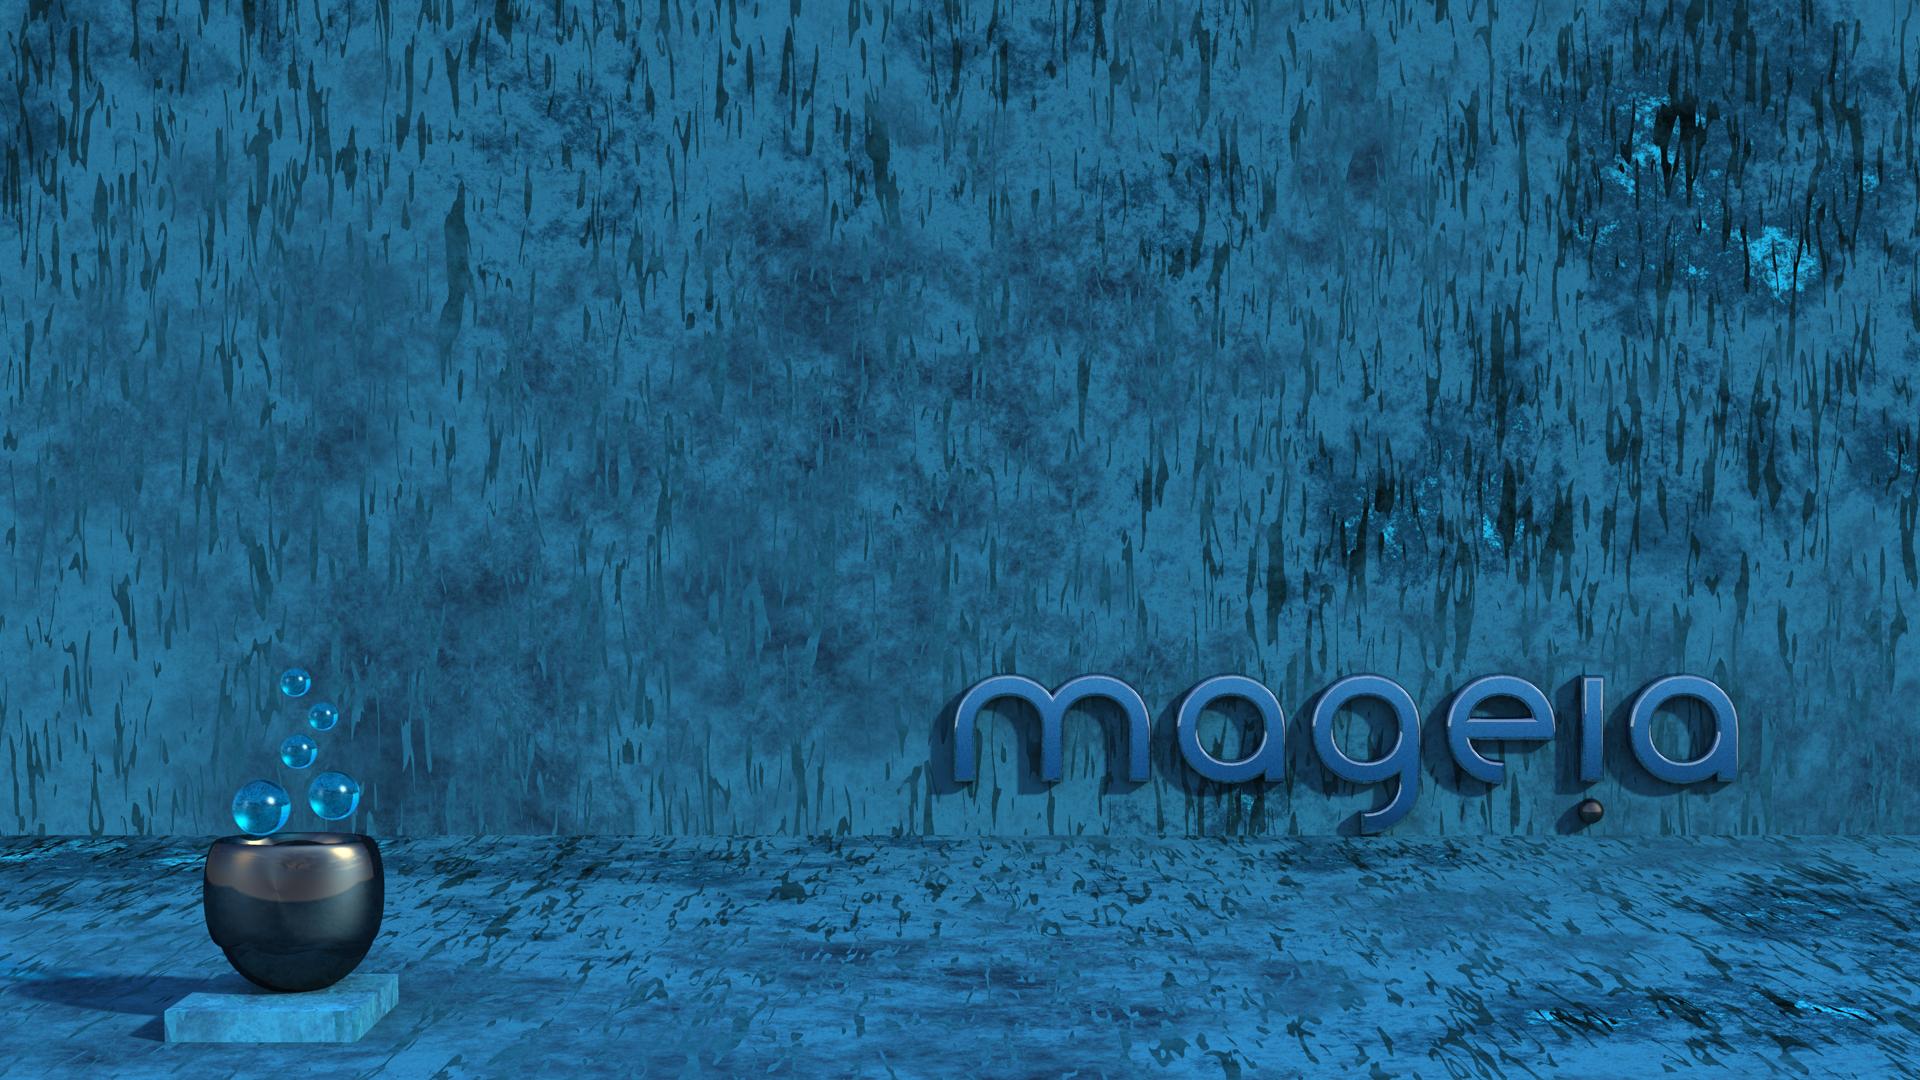 mageia CauldronWall2smtxt.png